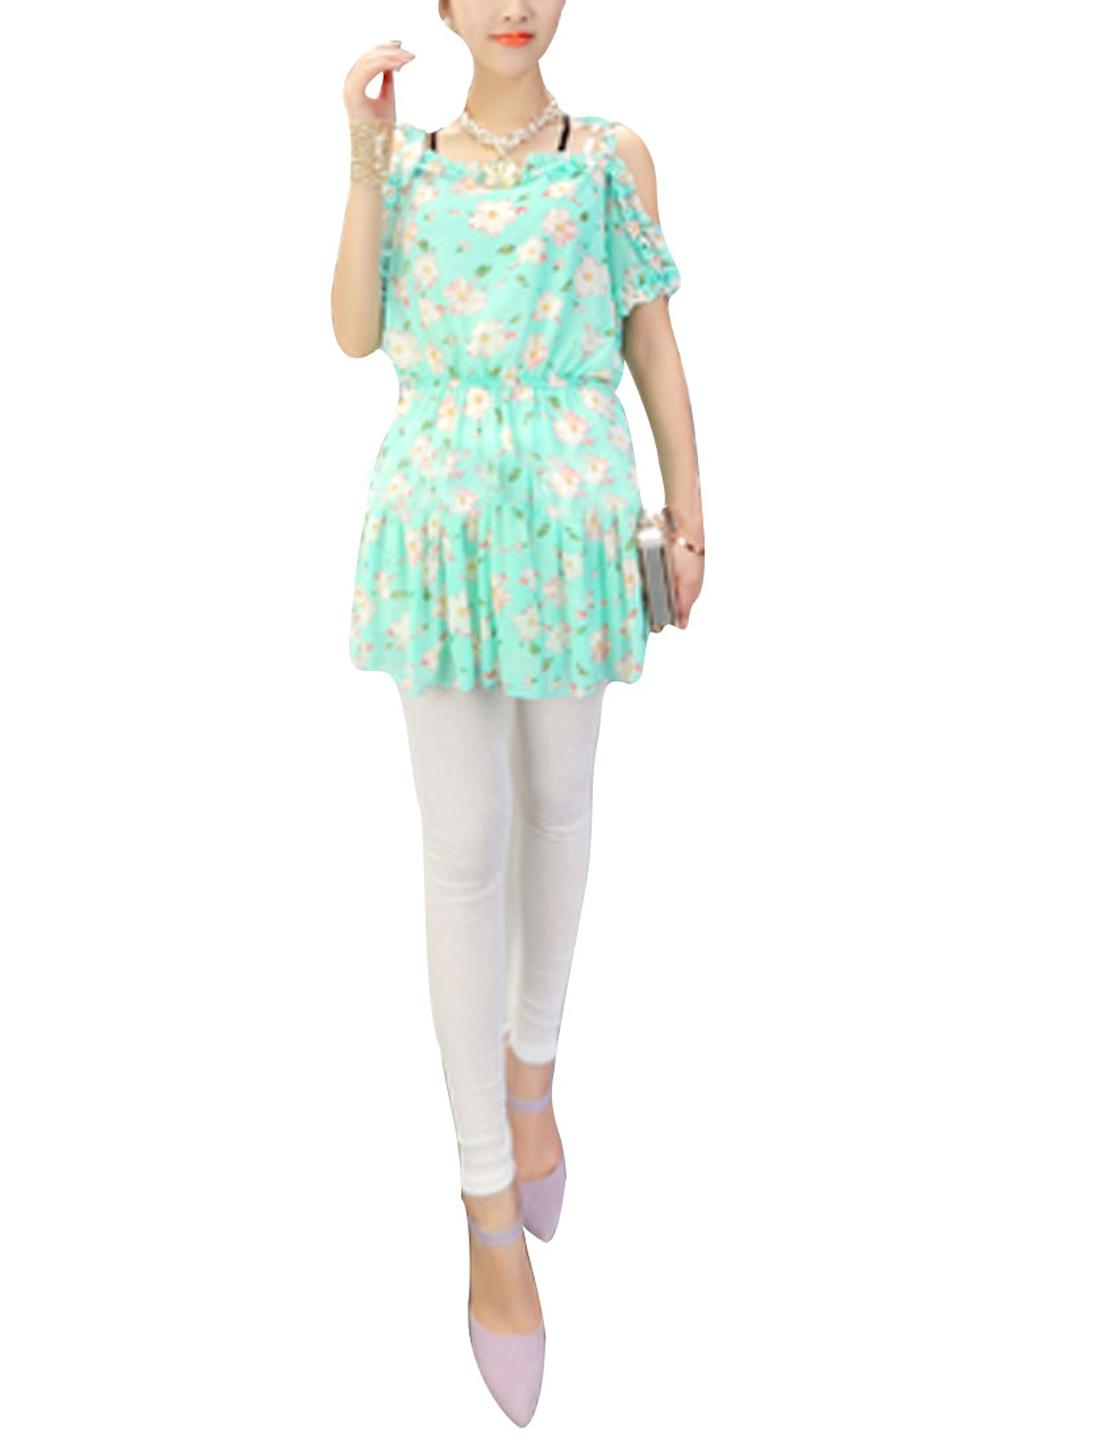 Lady Ruffled Neckline Decor Floral Prints Split Sleeve Pleated Dress Mint Green XS